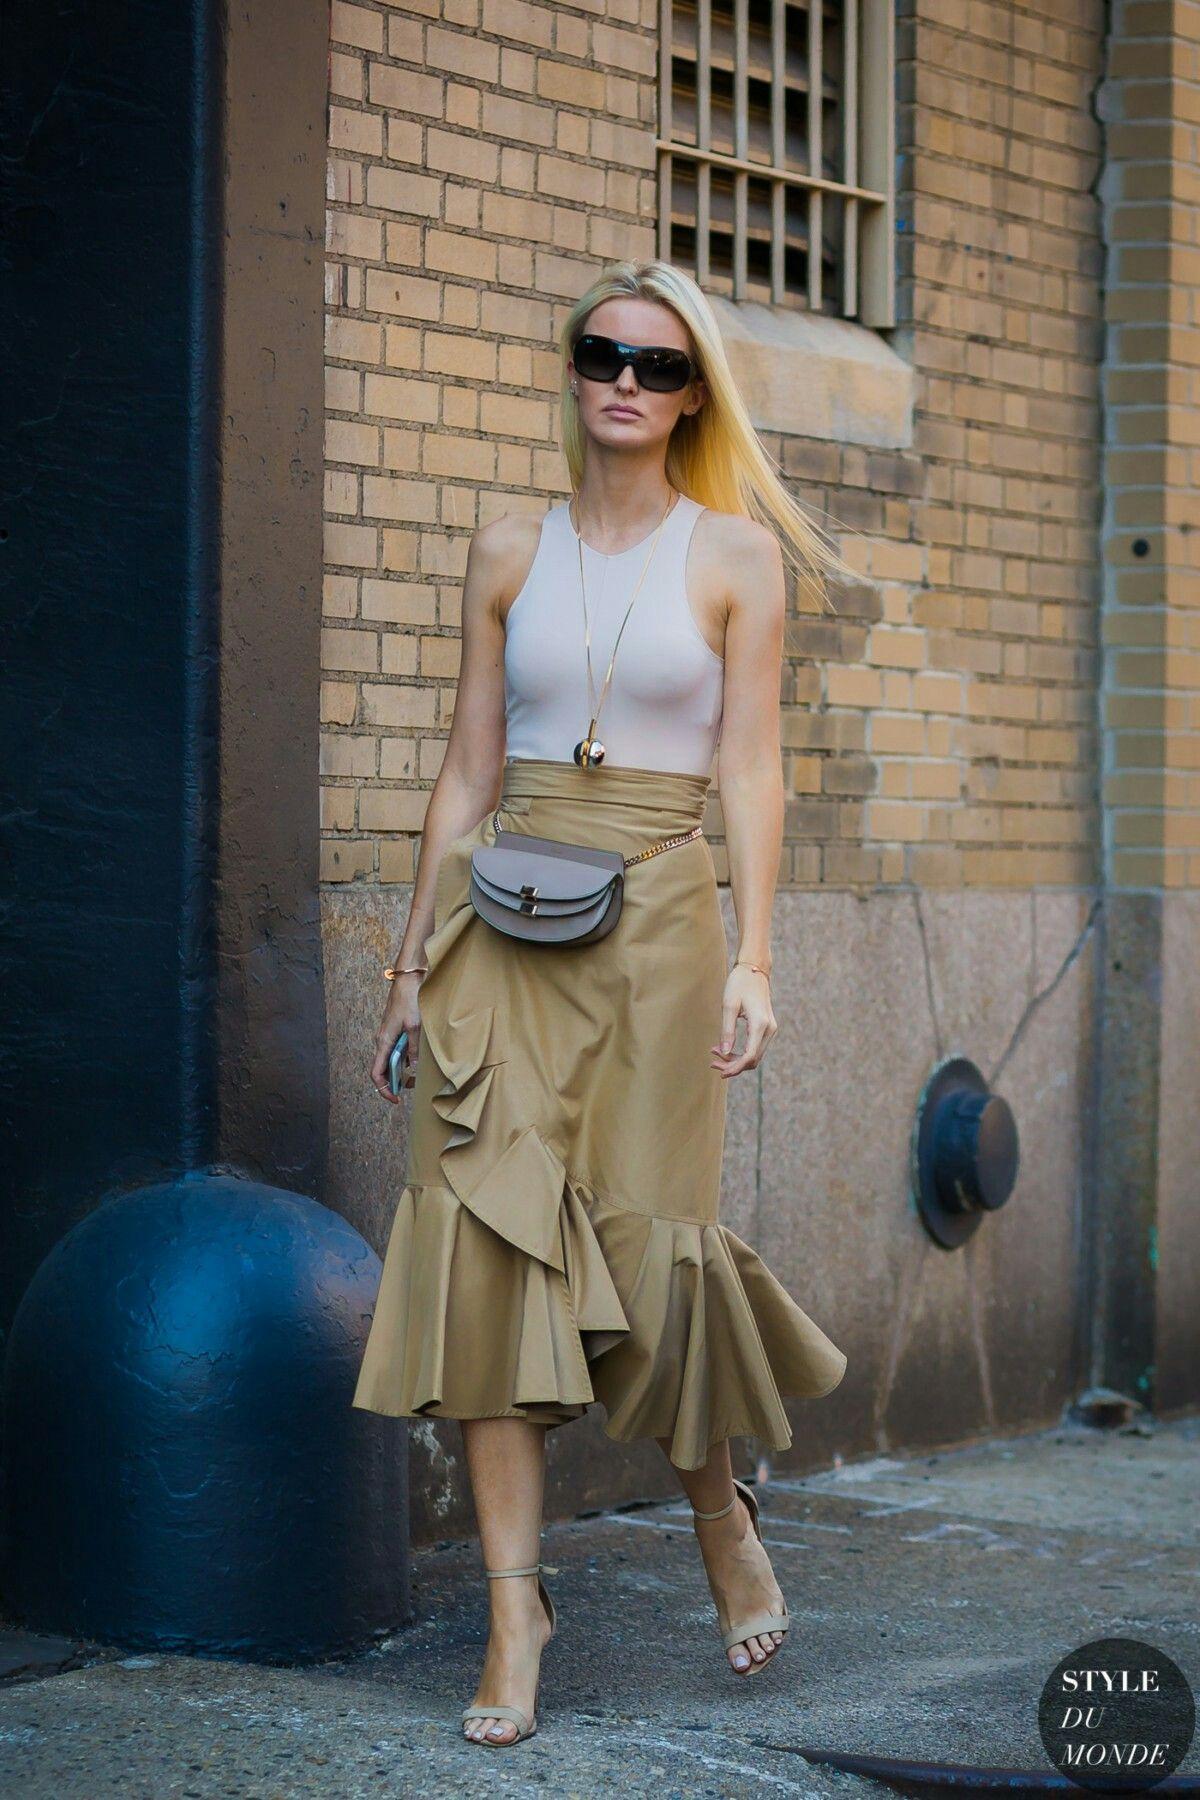 Body, wrap skirt with ruffles